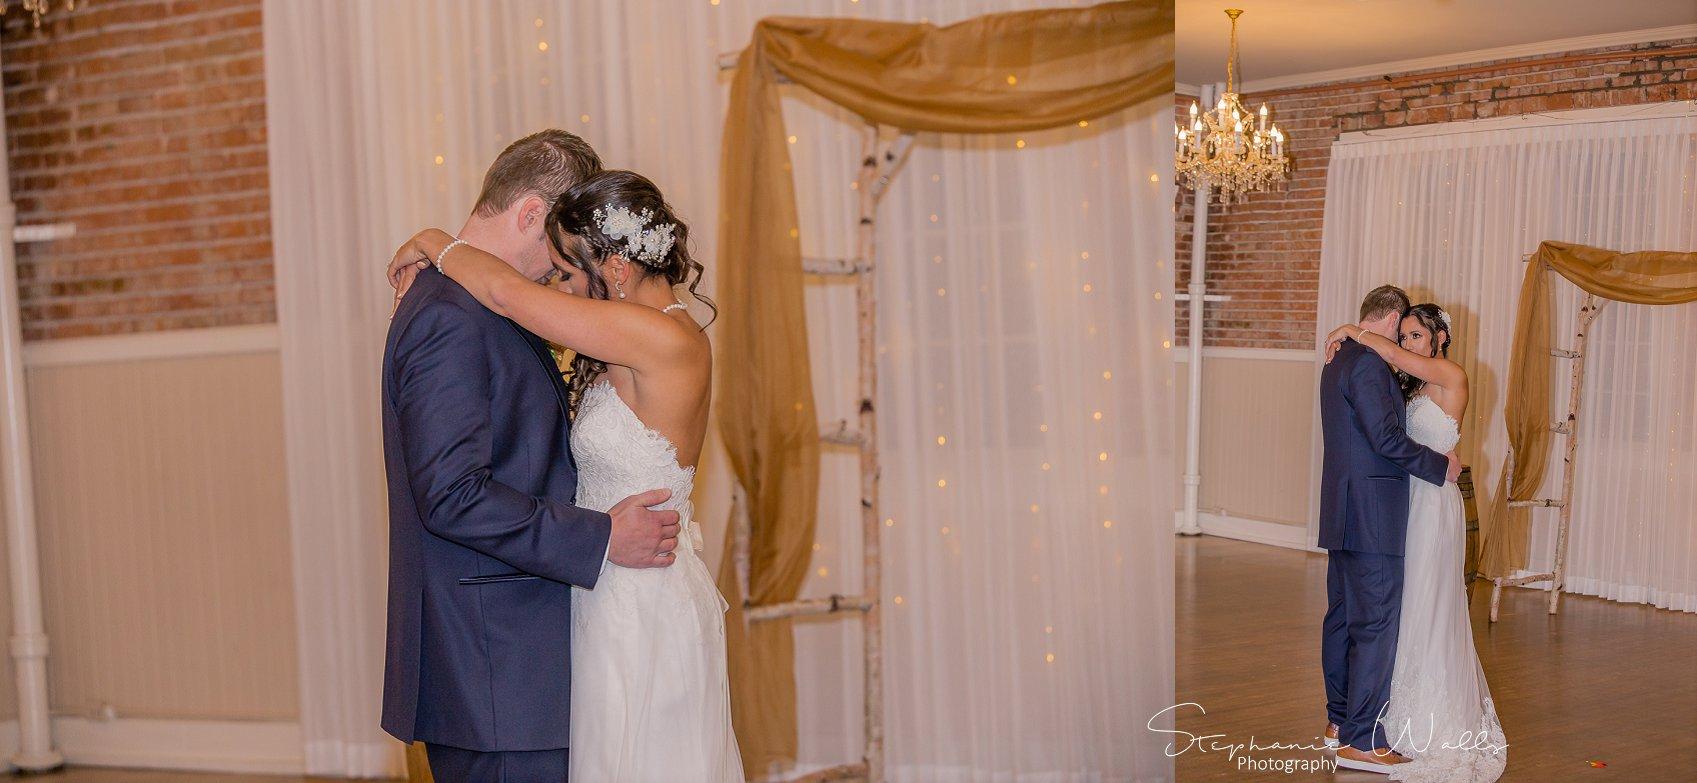 1st Dance Dancing 021 KK & Zack | Hollywood Schoolhouse Wedding | Woodinville, Wa Wedding Photographer